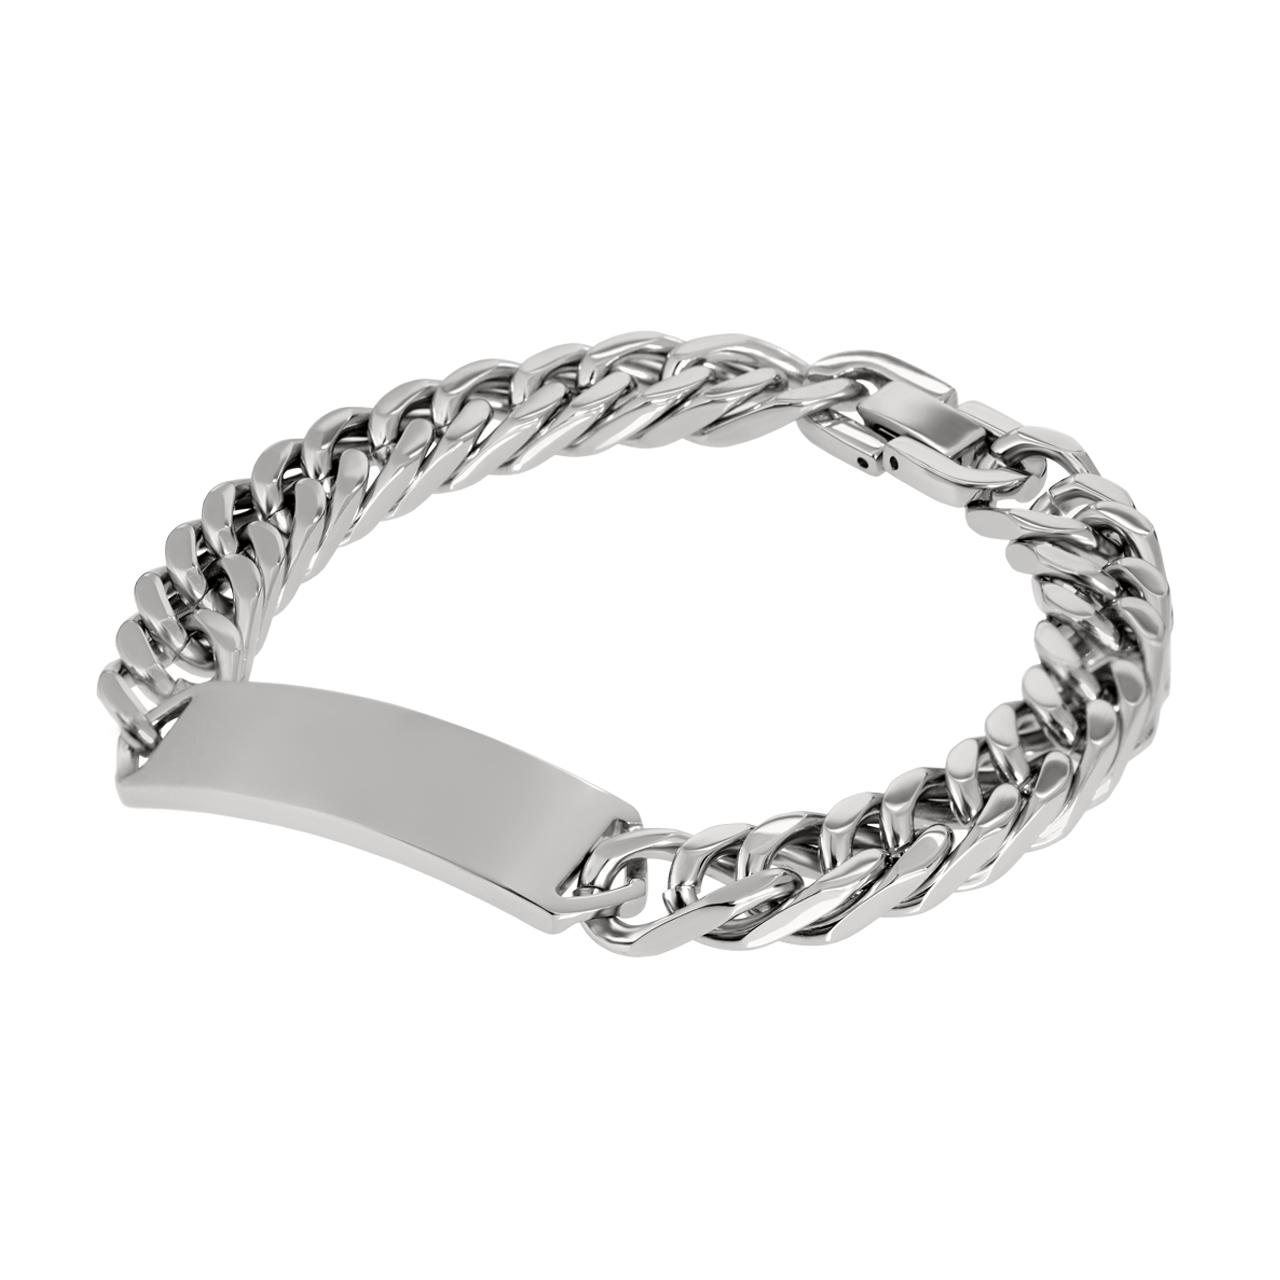 دستبند مردانه اقلیمه کد DS425